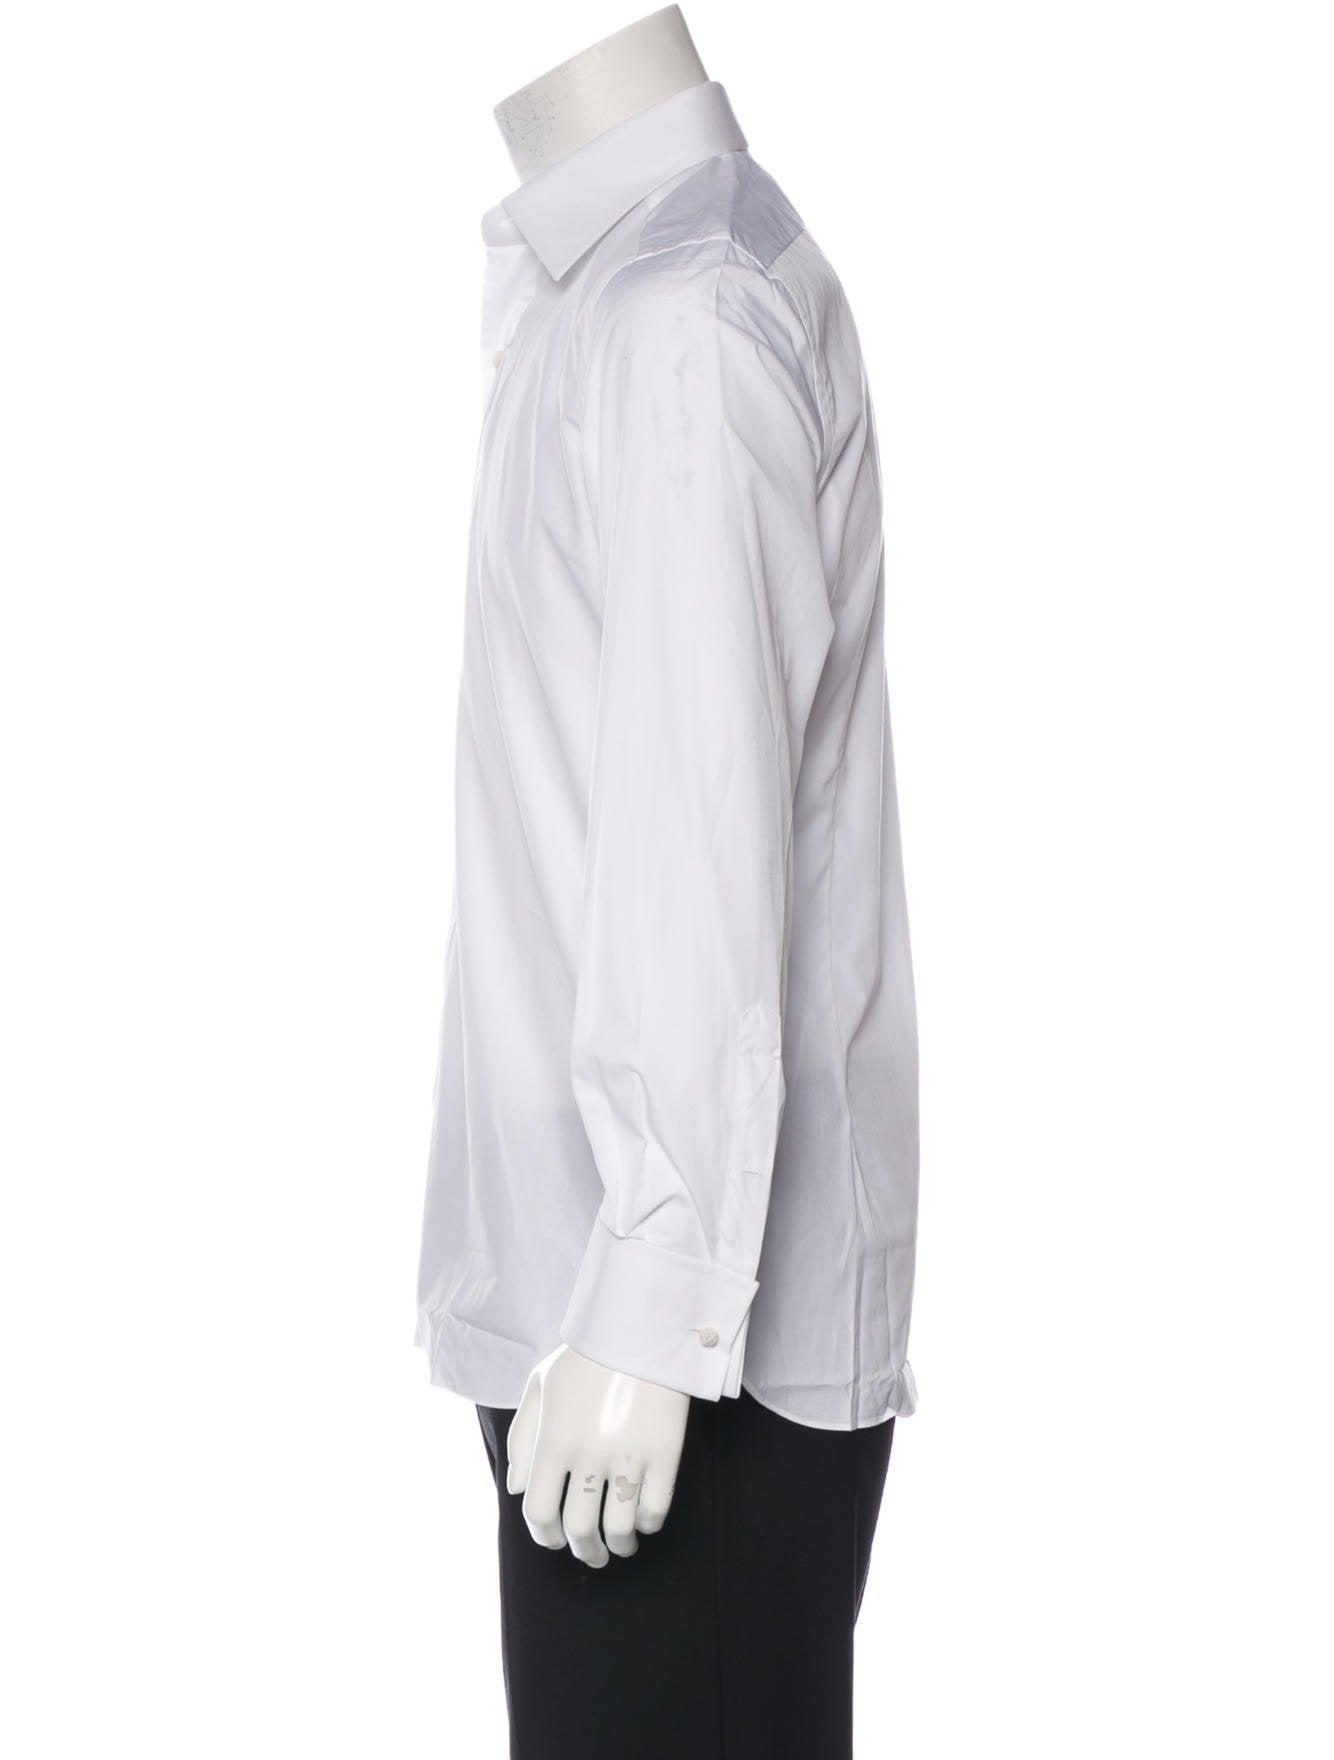 Tom Ford French Cuff Dress Shirt Clothing Tom34541